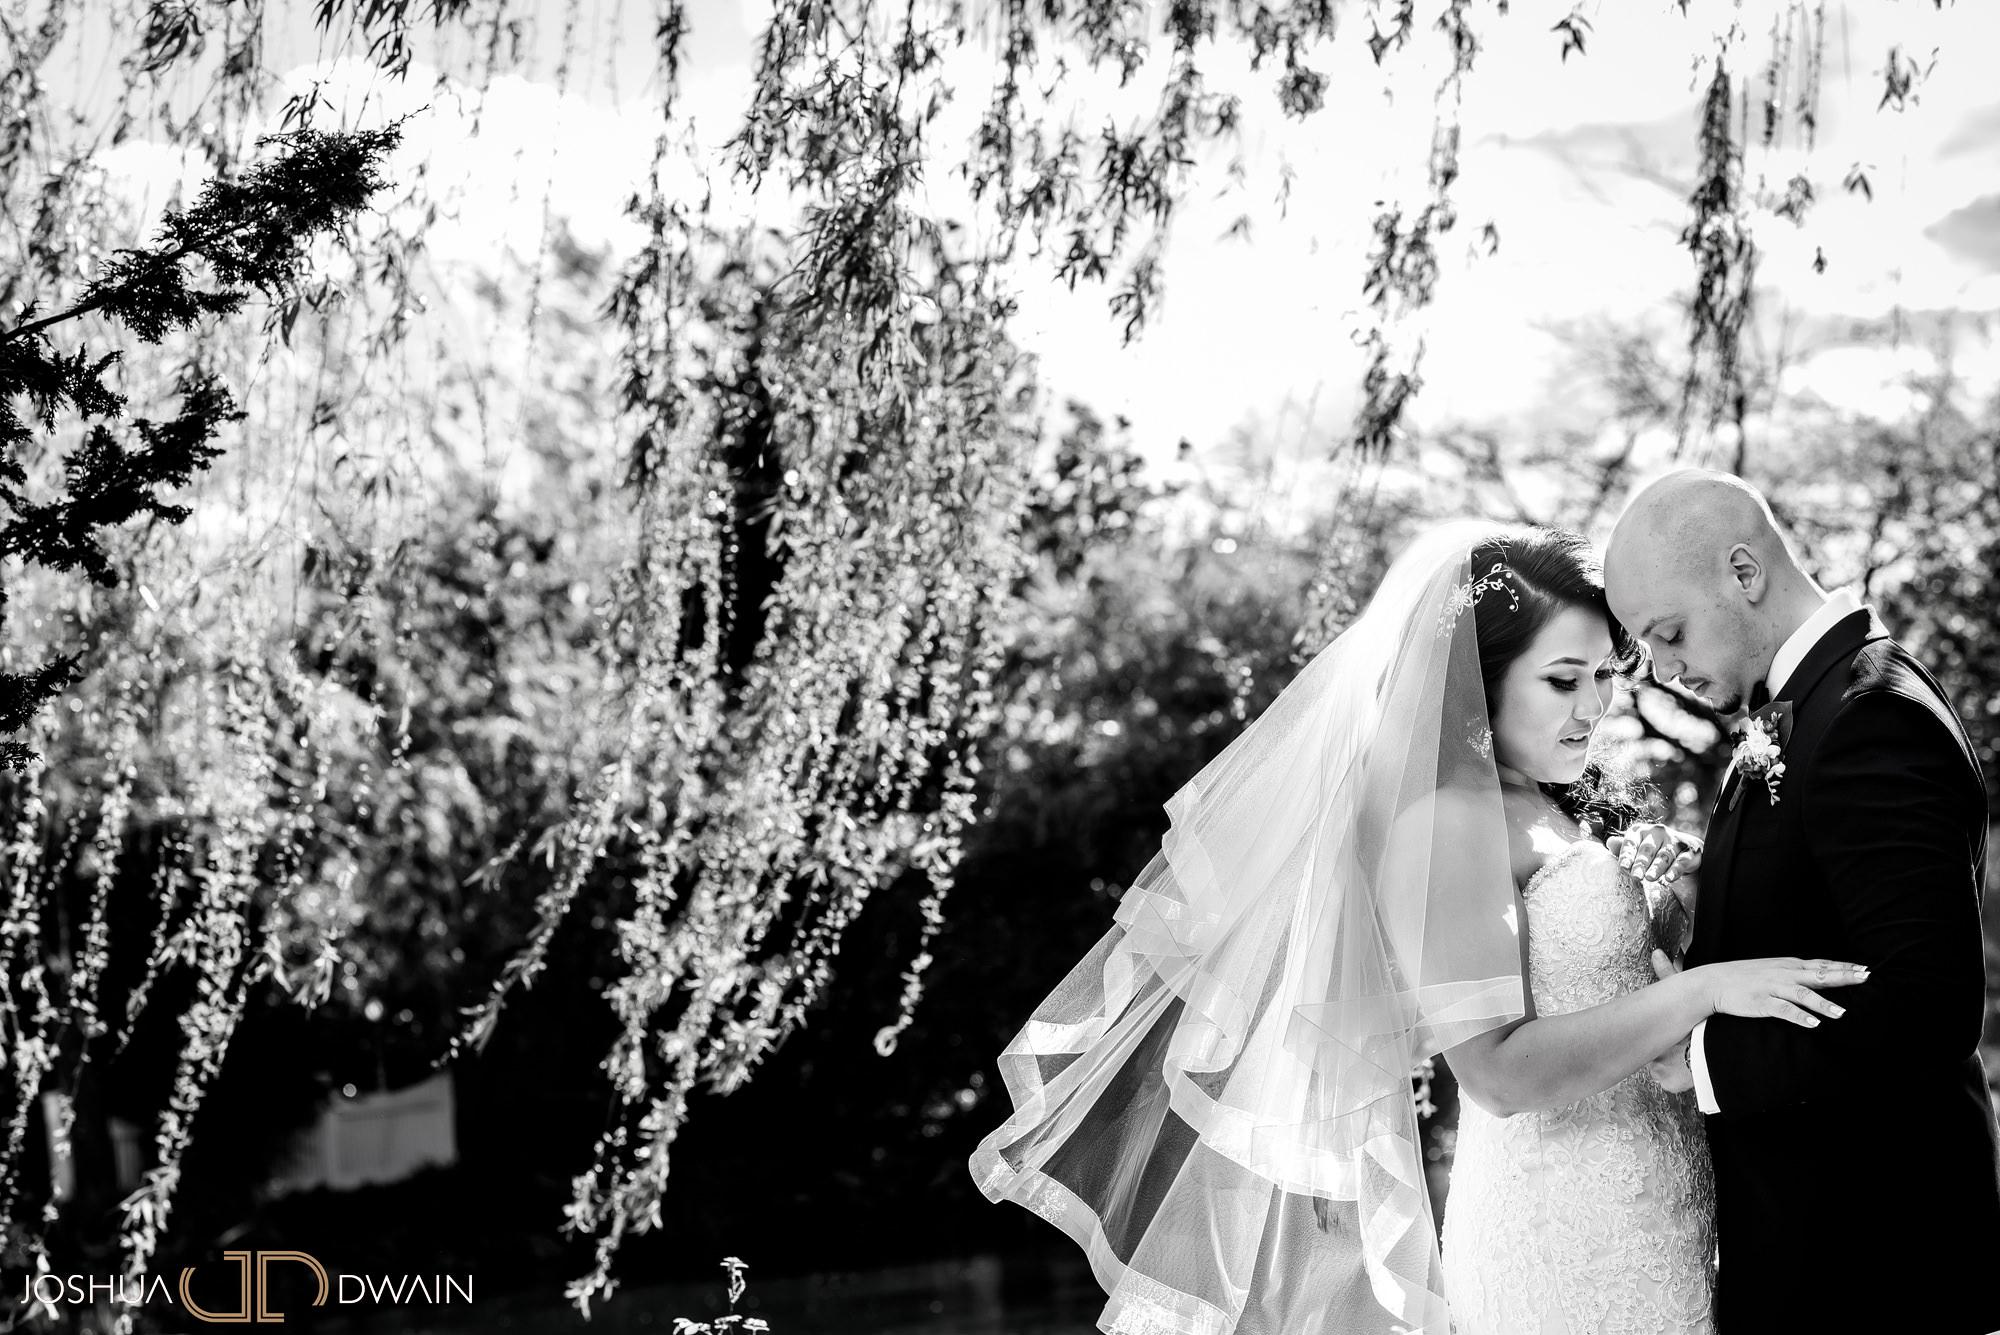 joshua-dwain-weddings-gallery-best-wedding-photographers-us-039